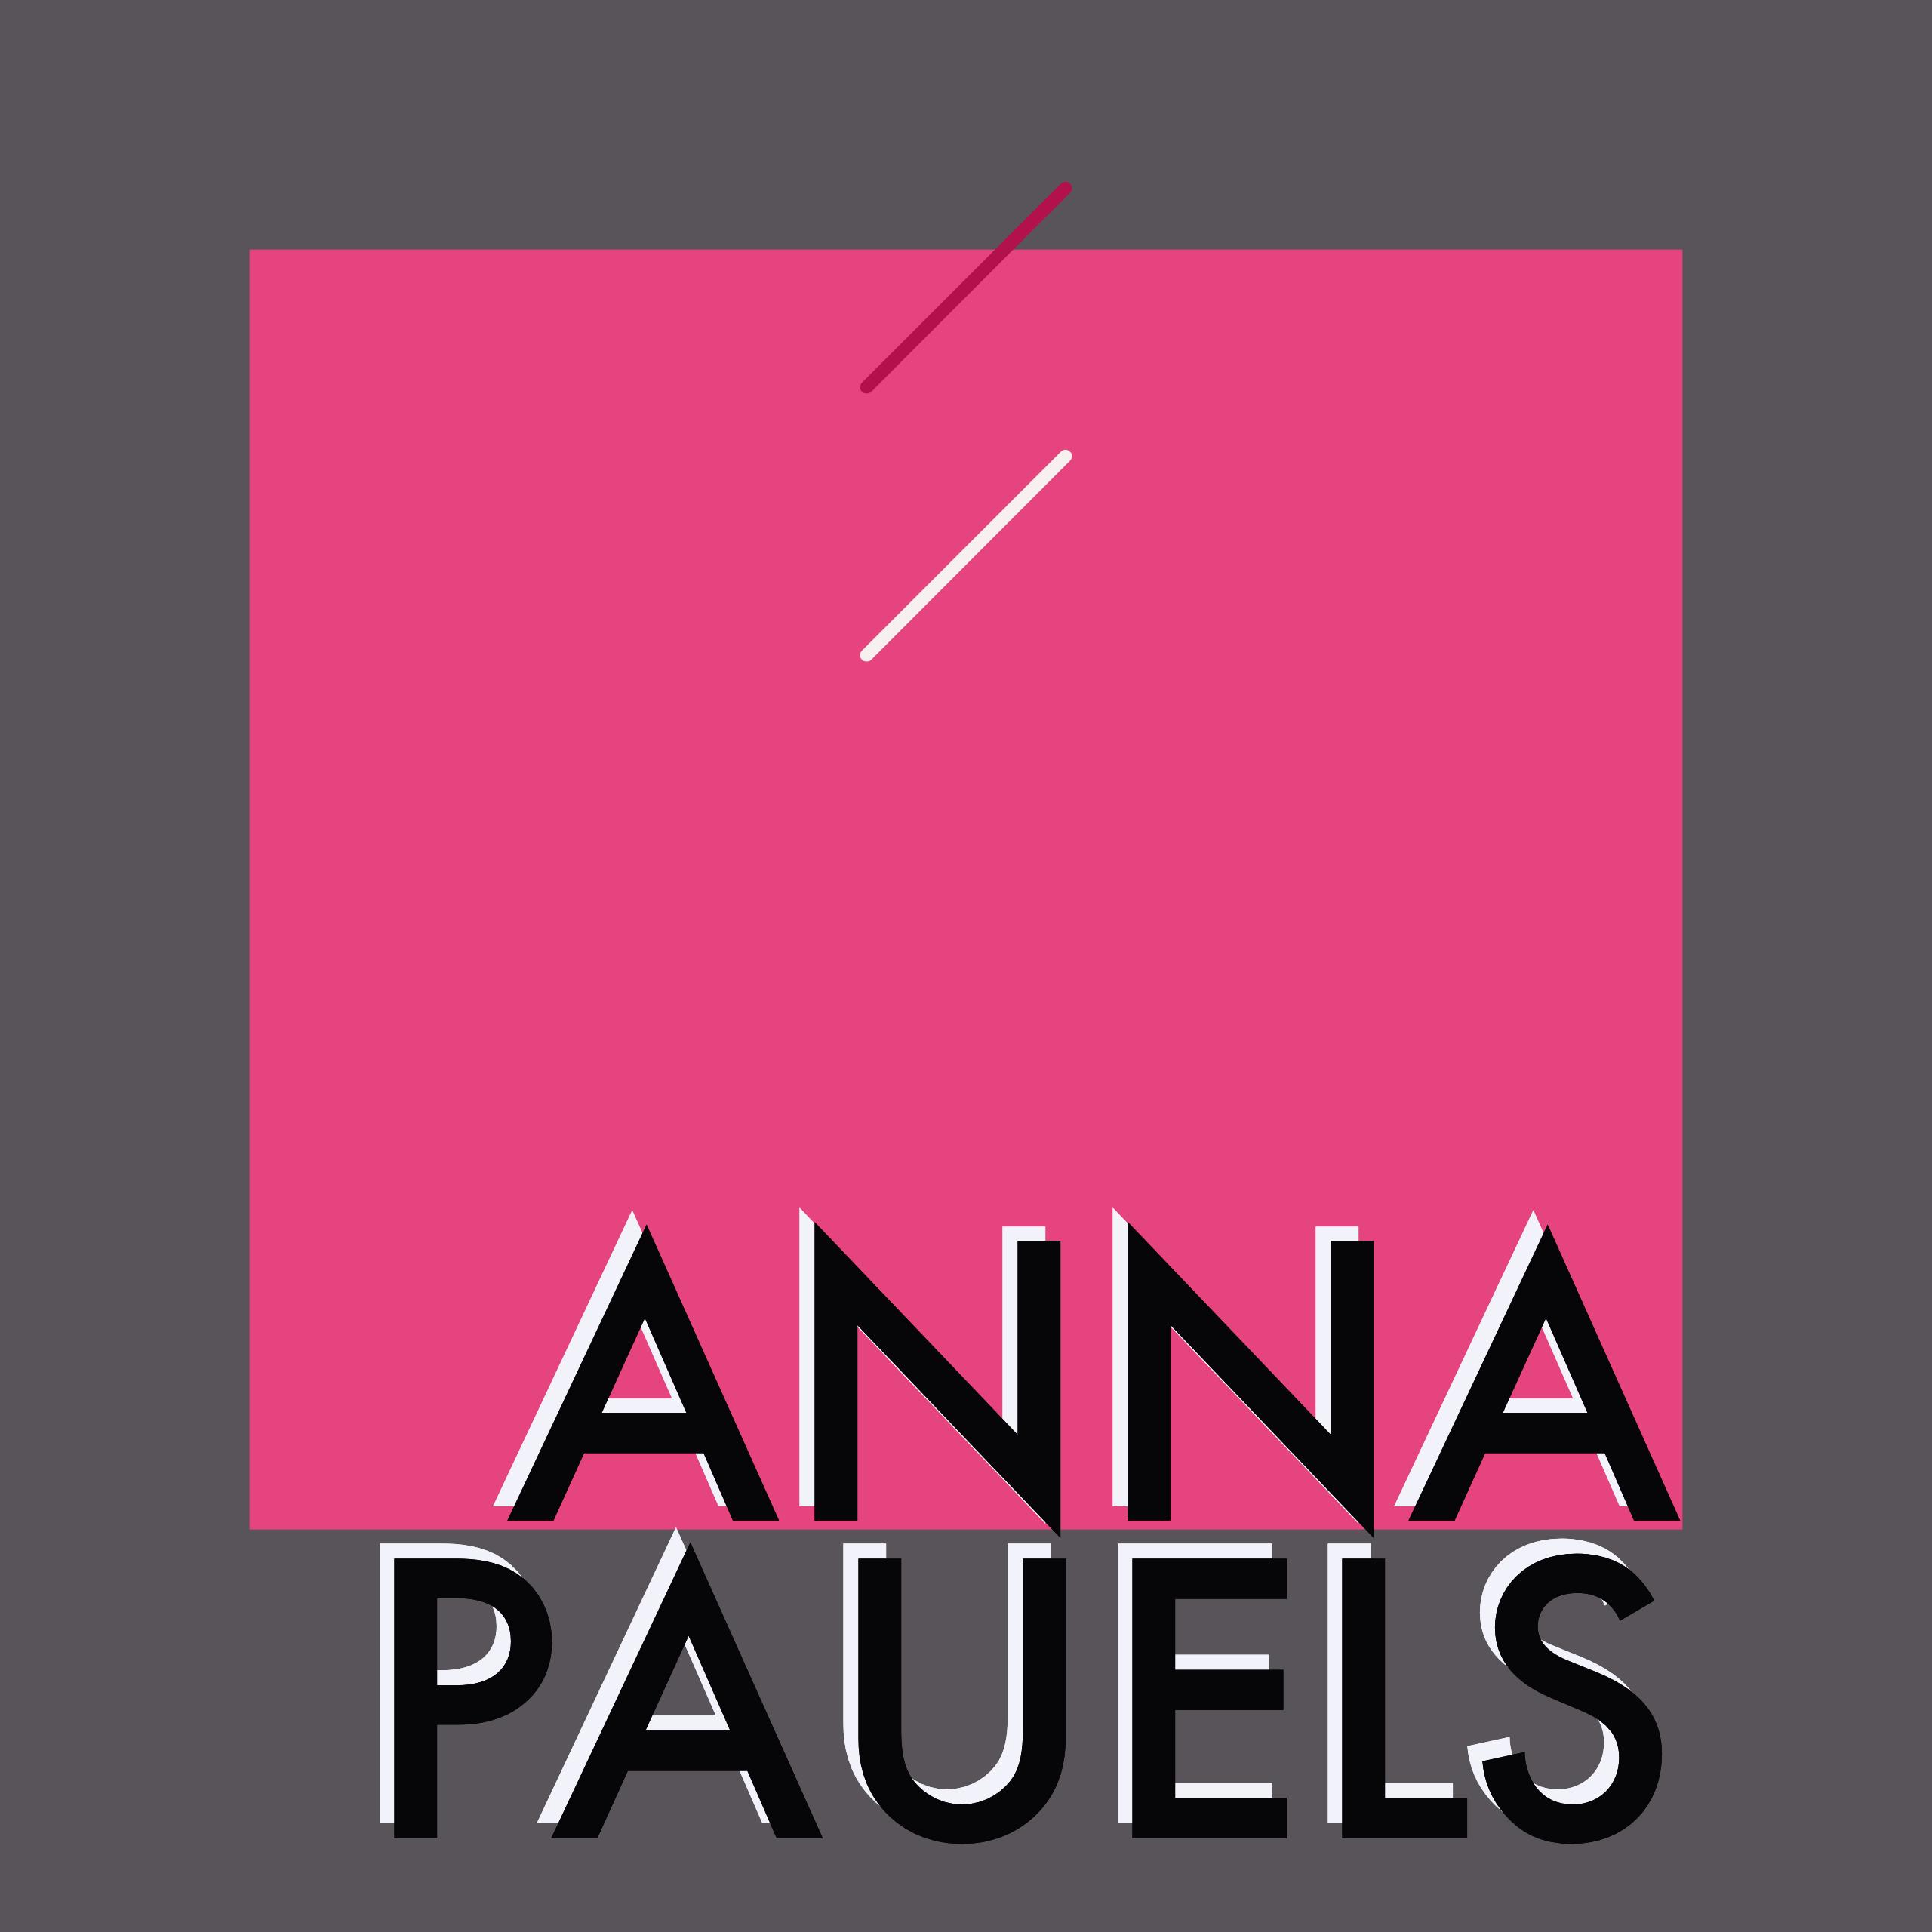 ANNA PAUELS